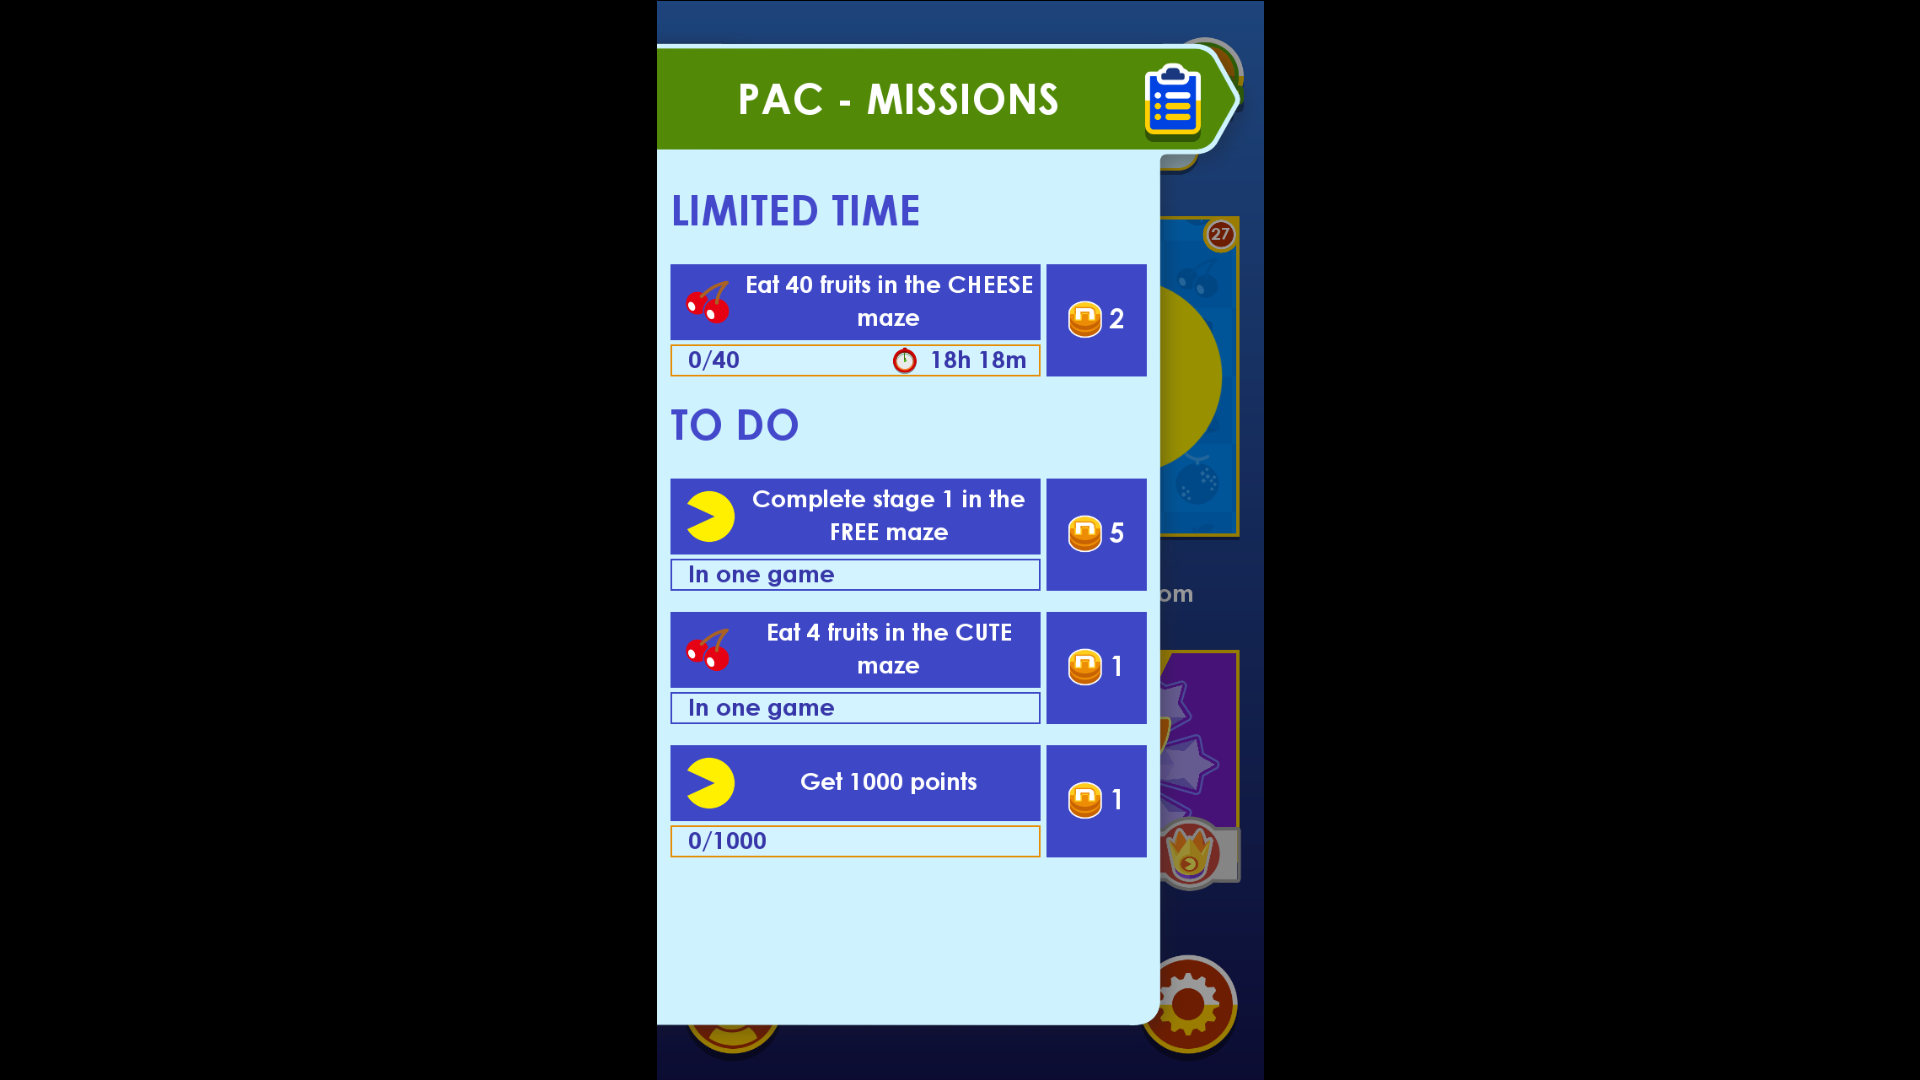 PAC-MAN Missions